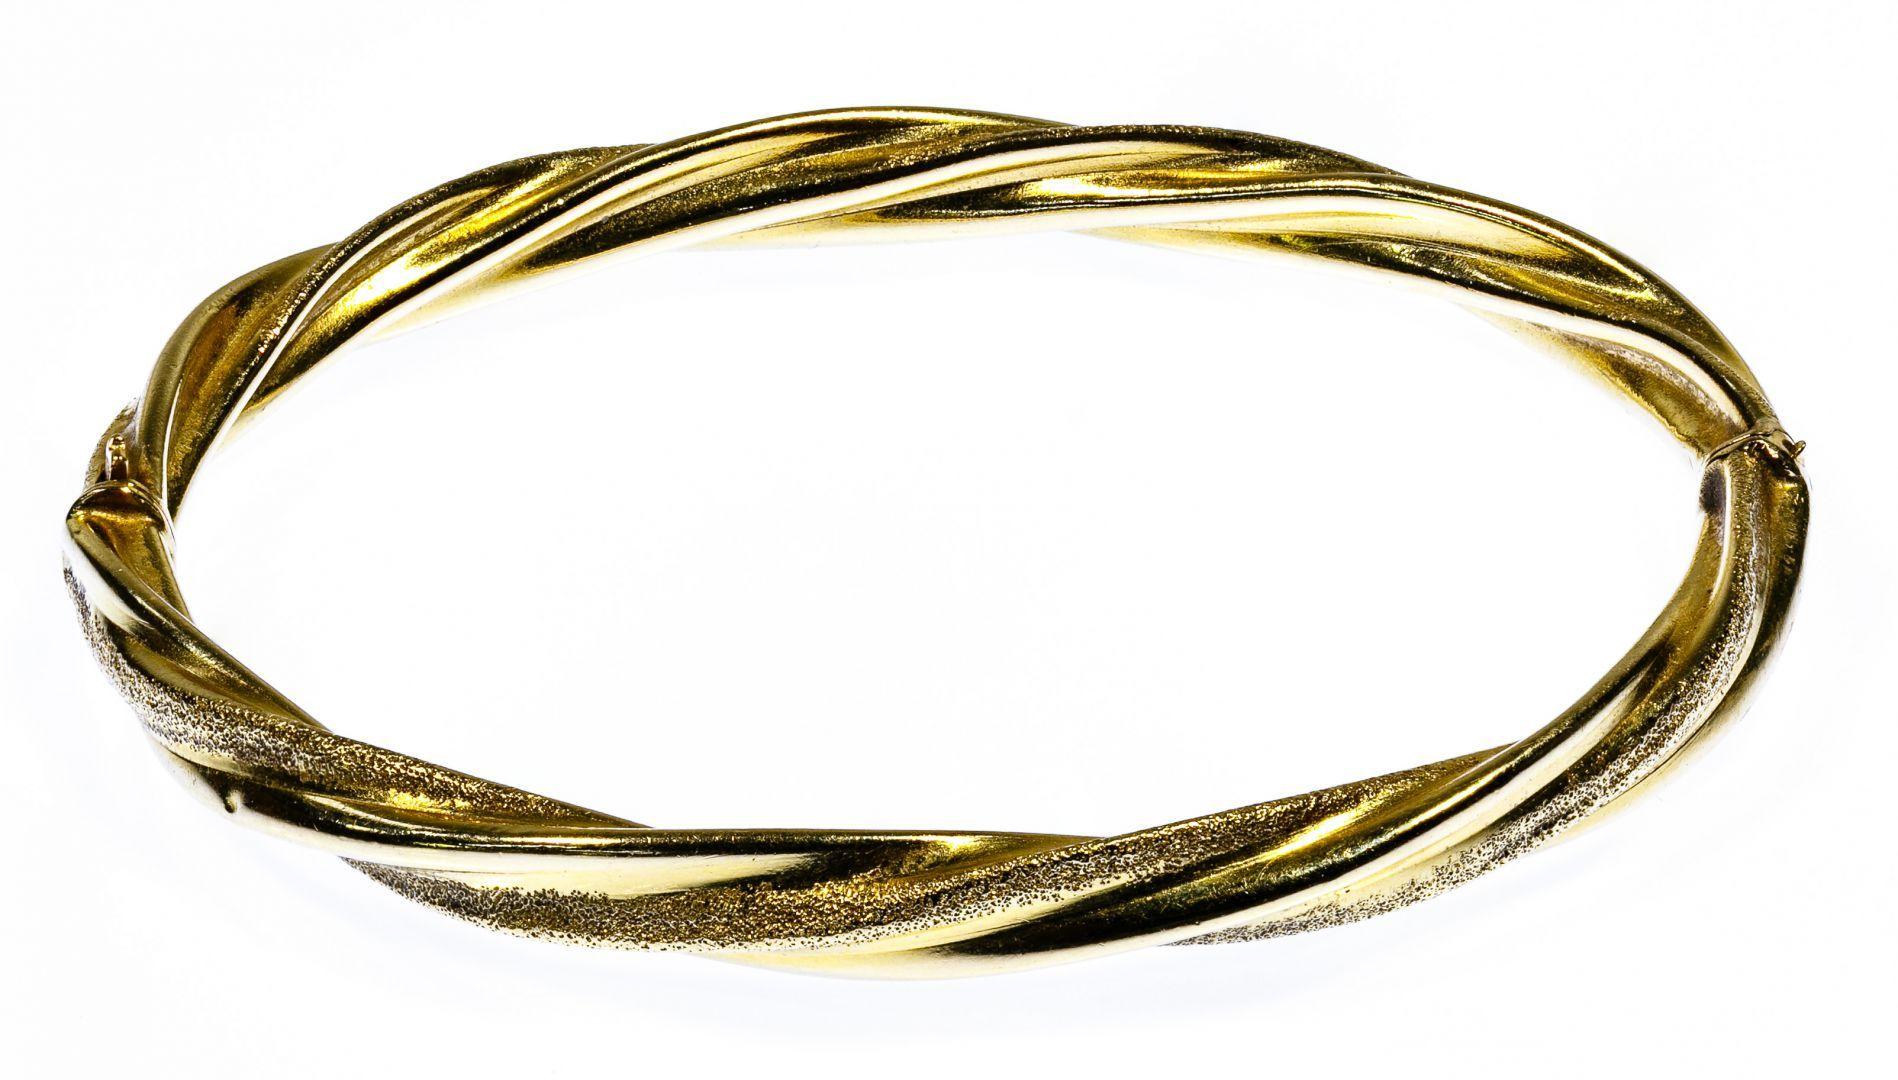 Lot 160 14k Gold Bangle Bracelet; Having hinged opening